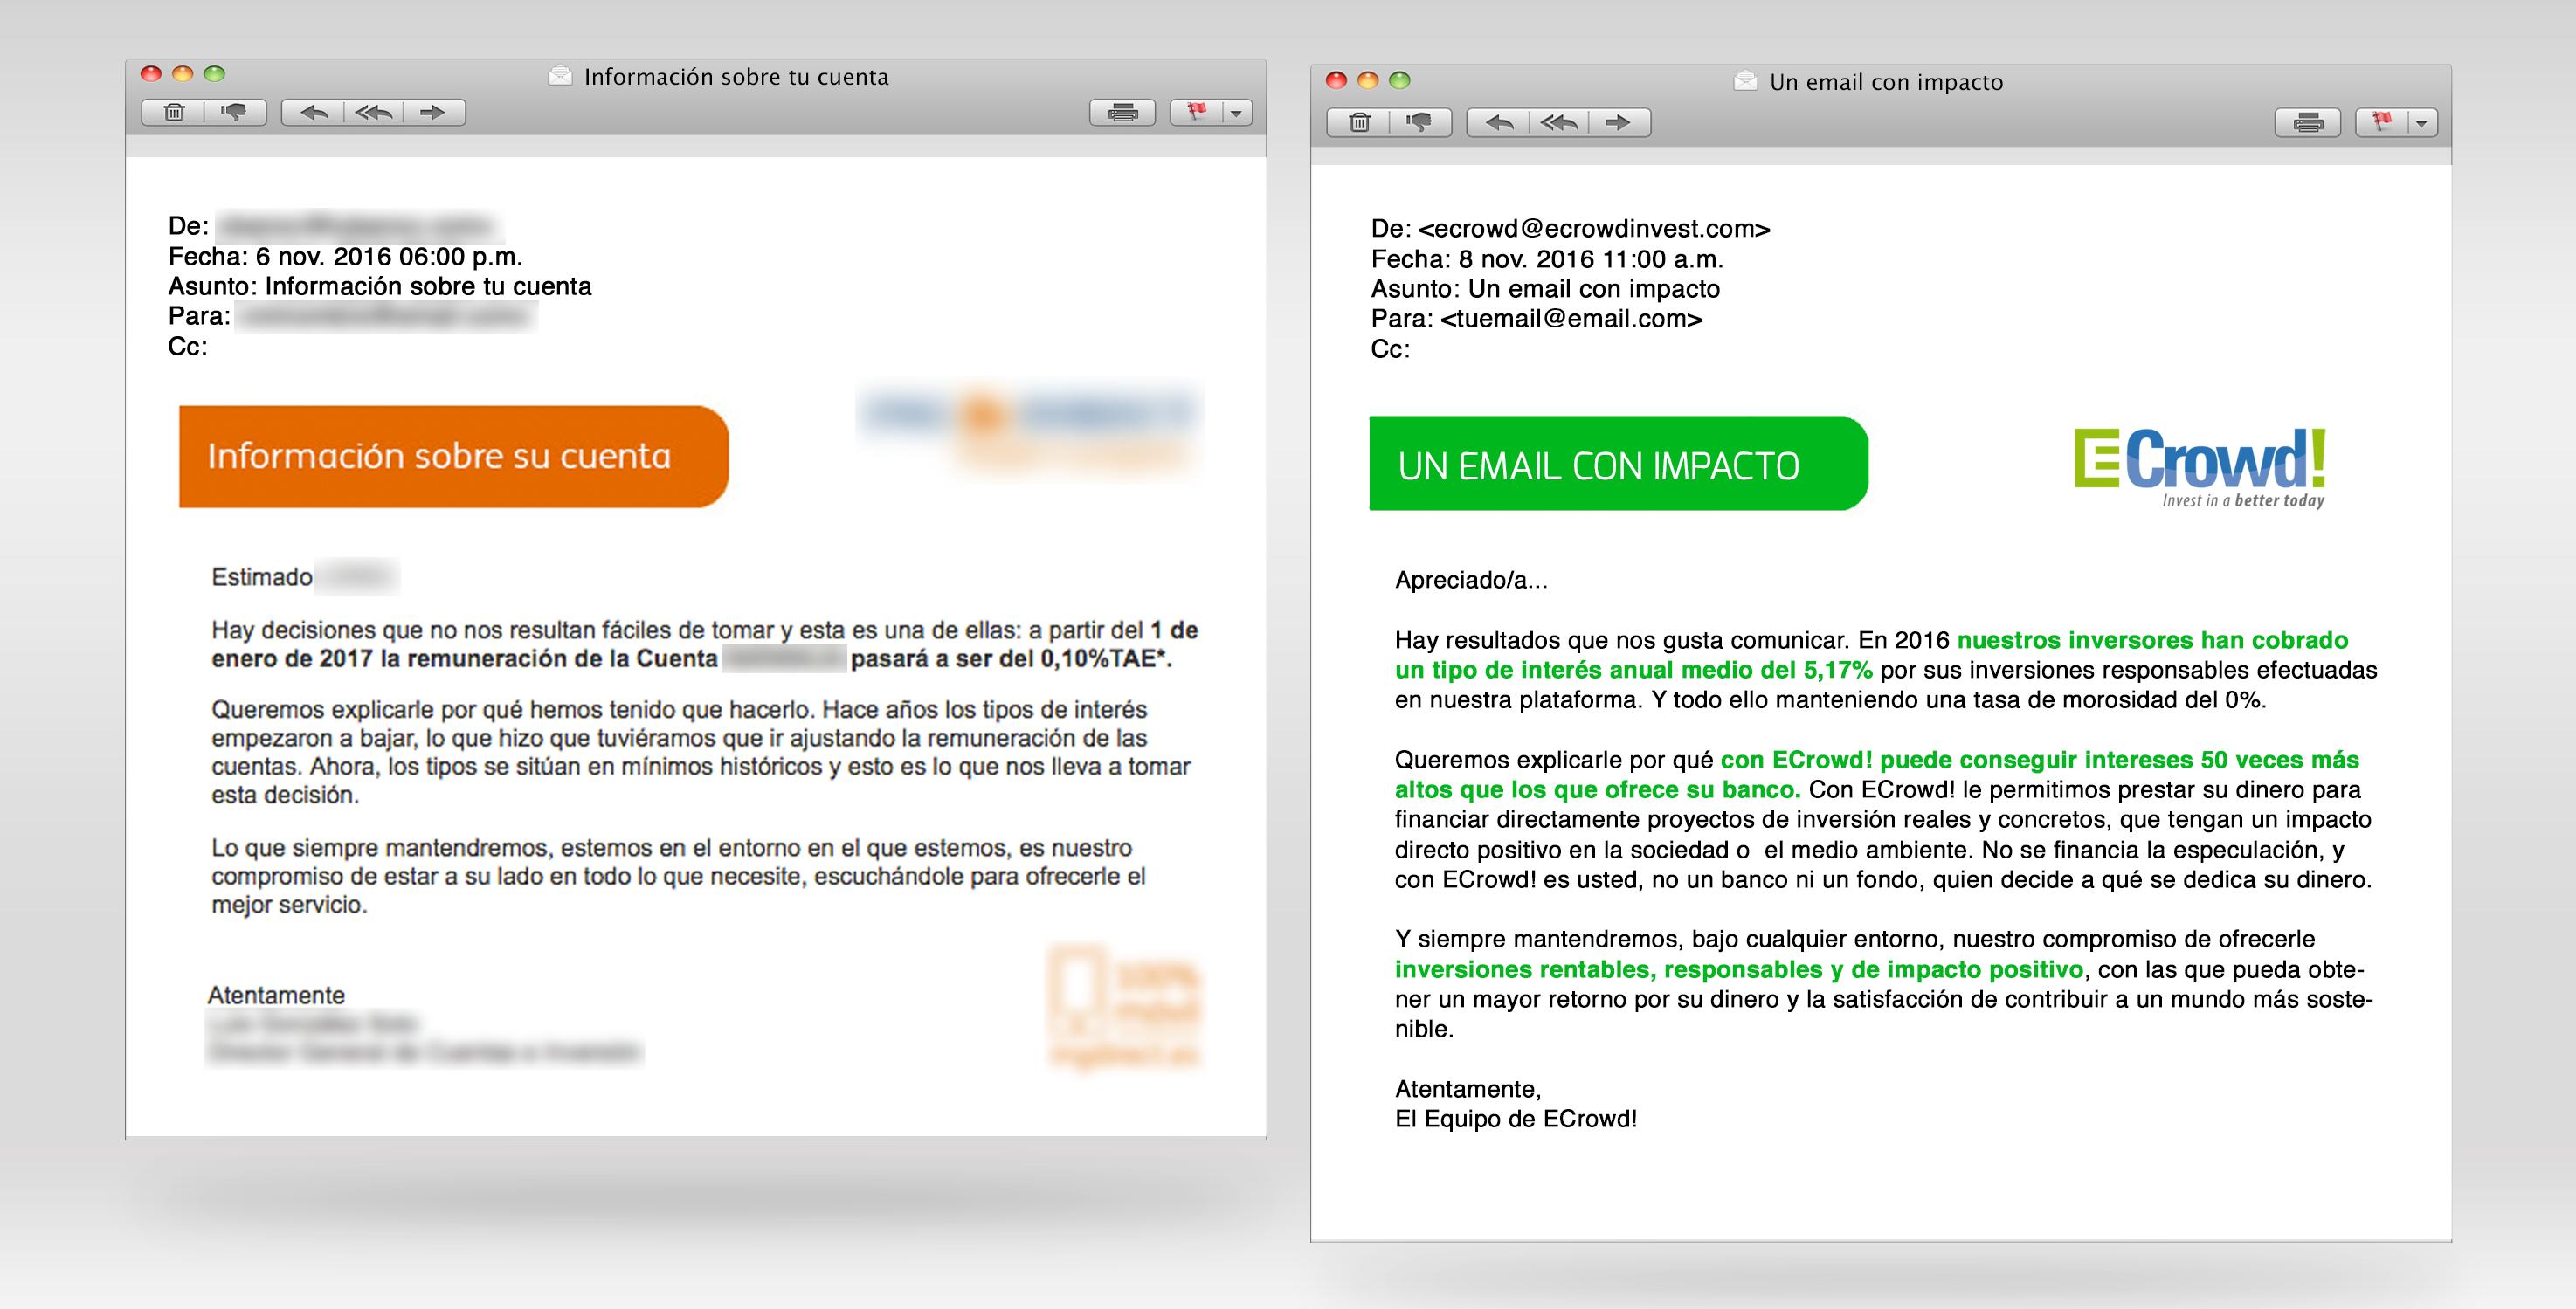 un email con impacto